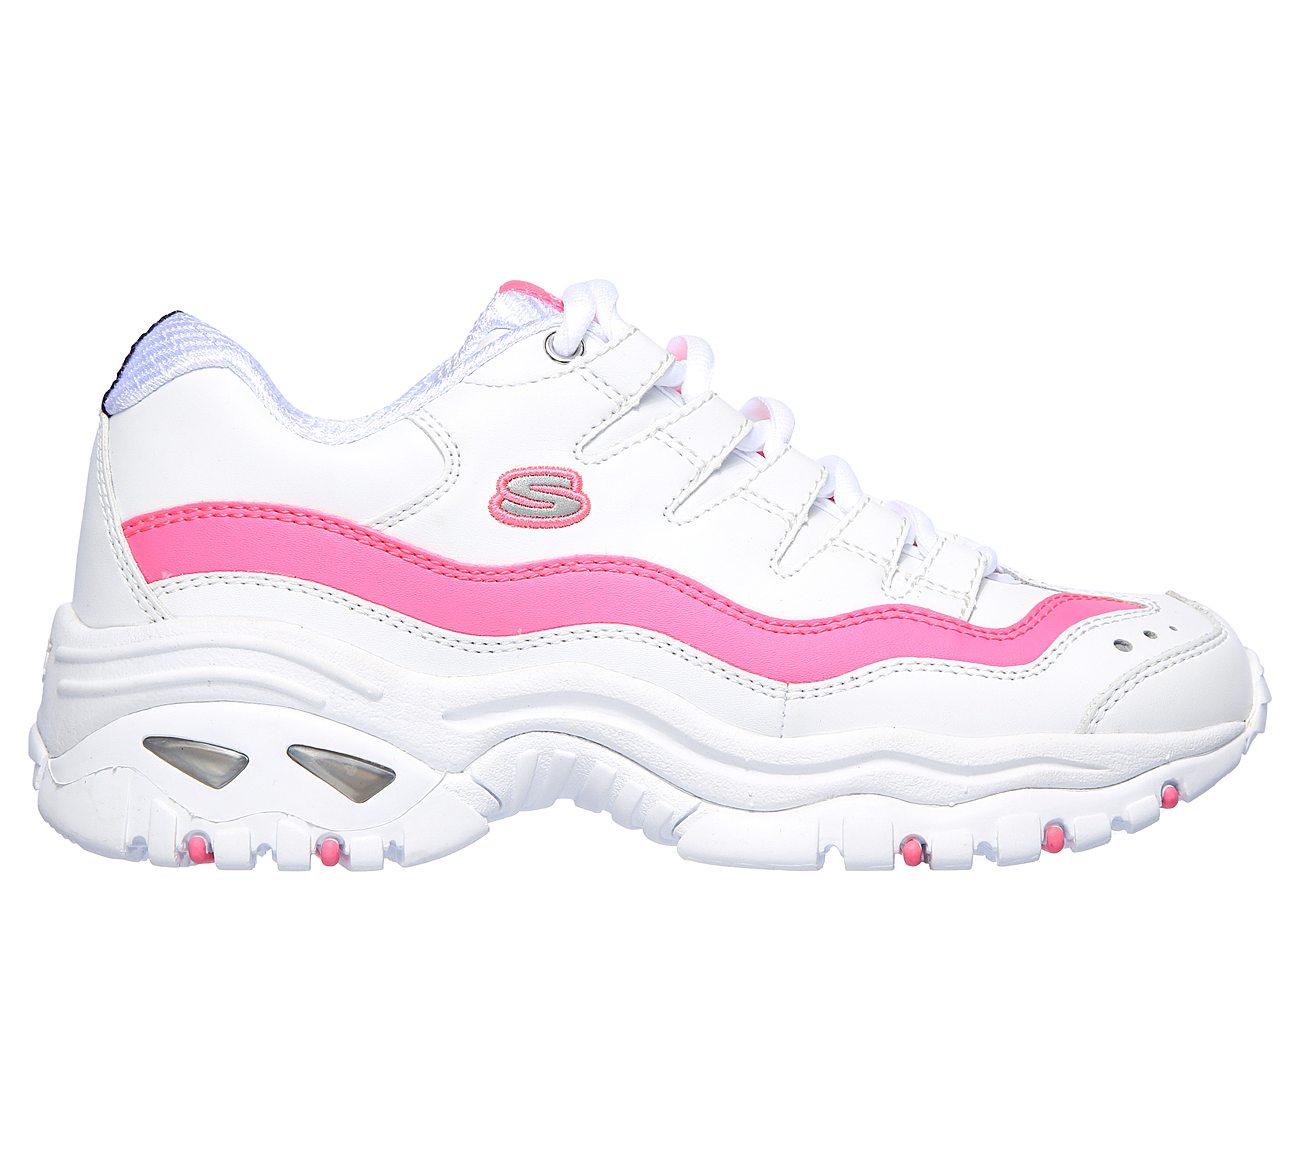 skechers pink tennis shoes